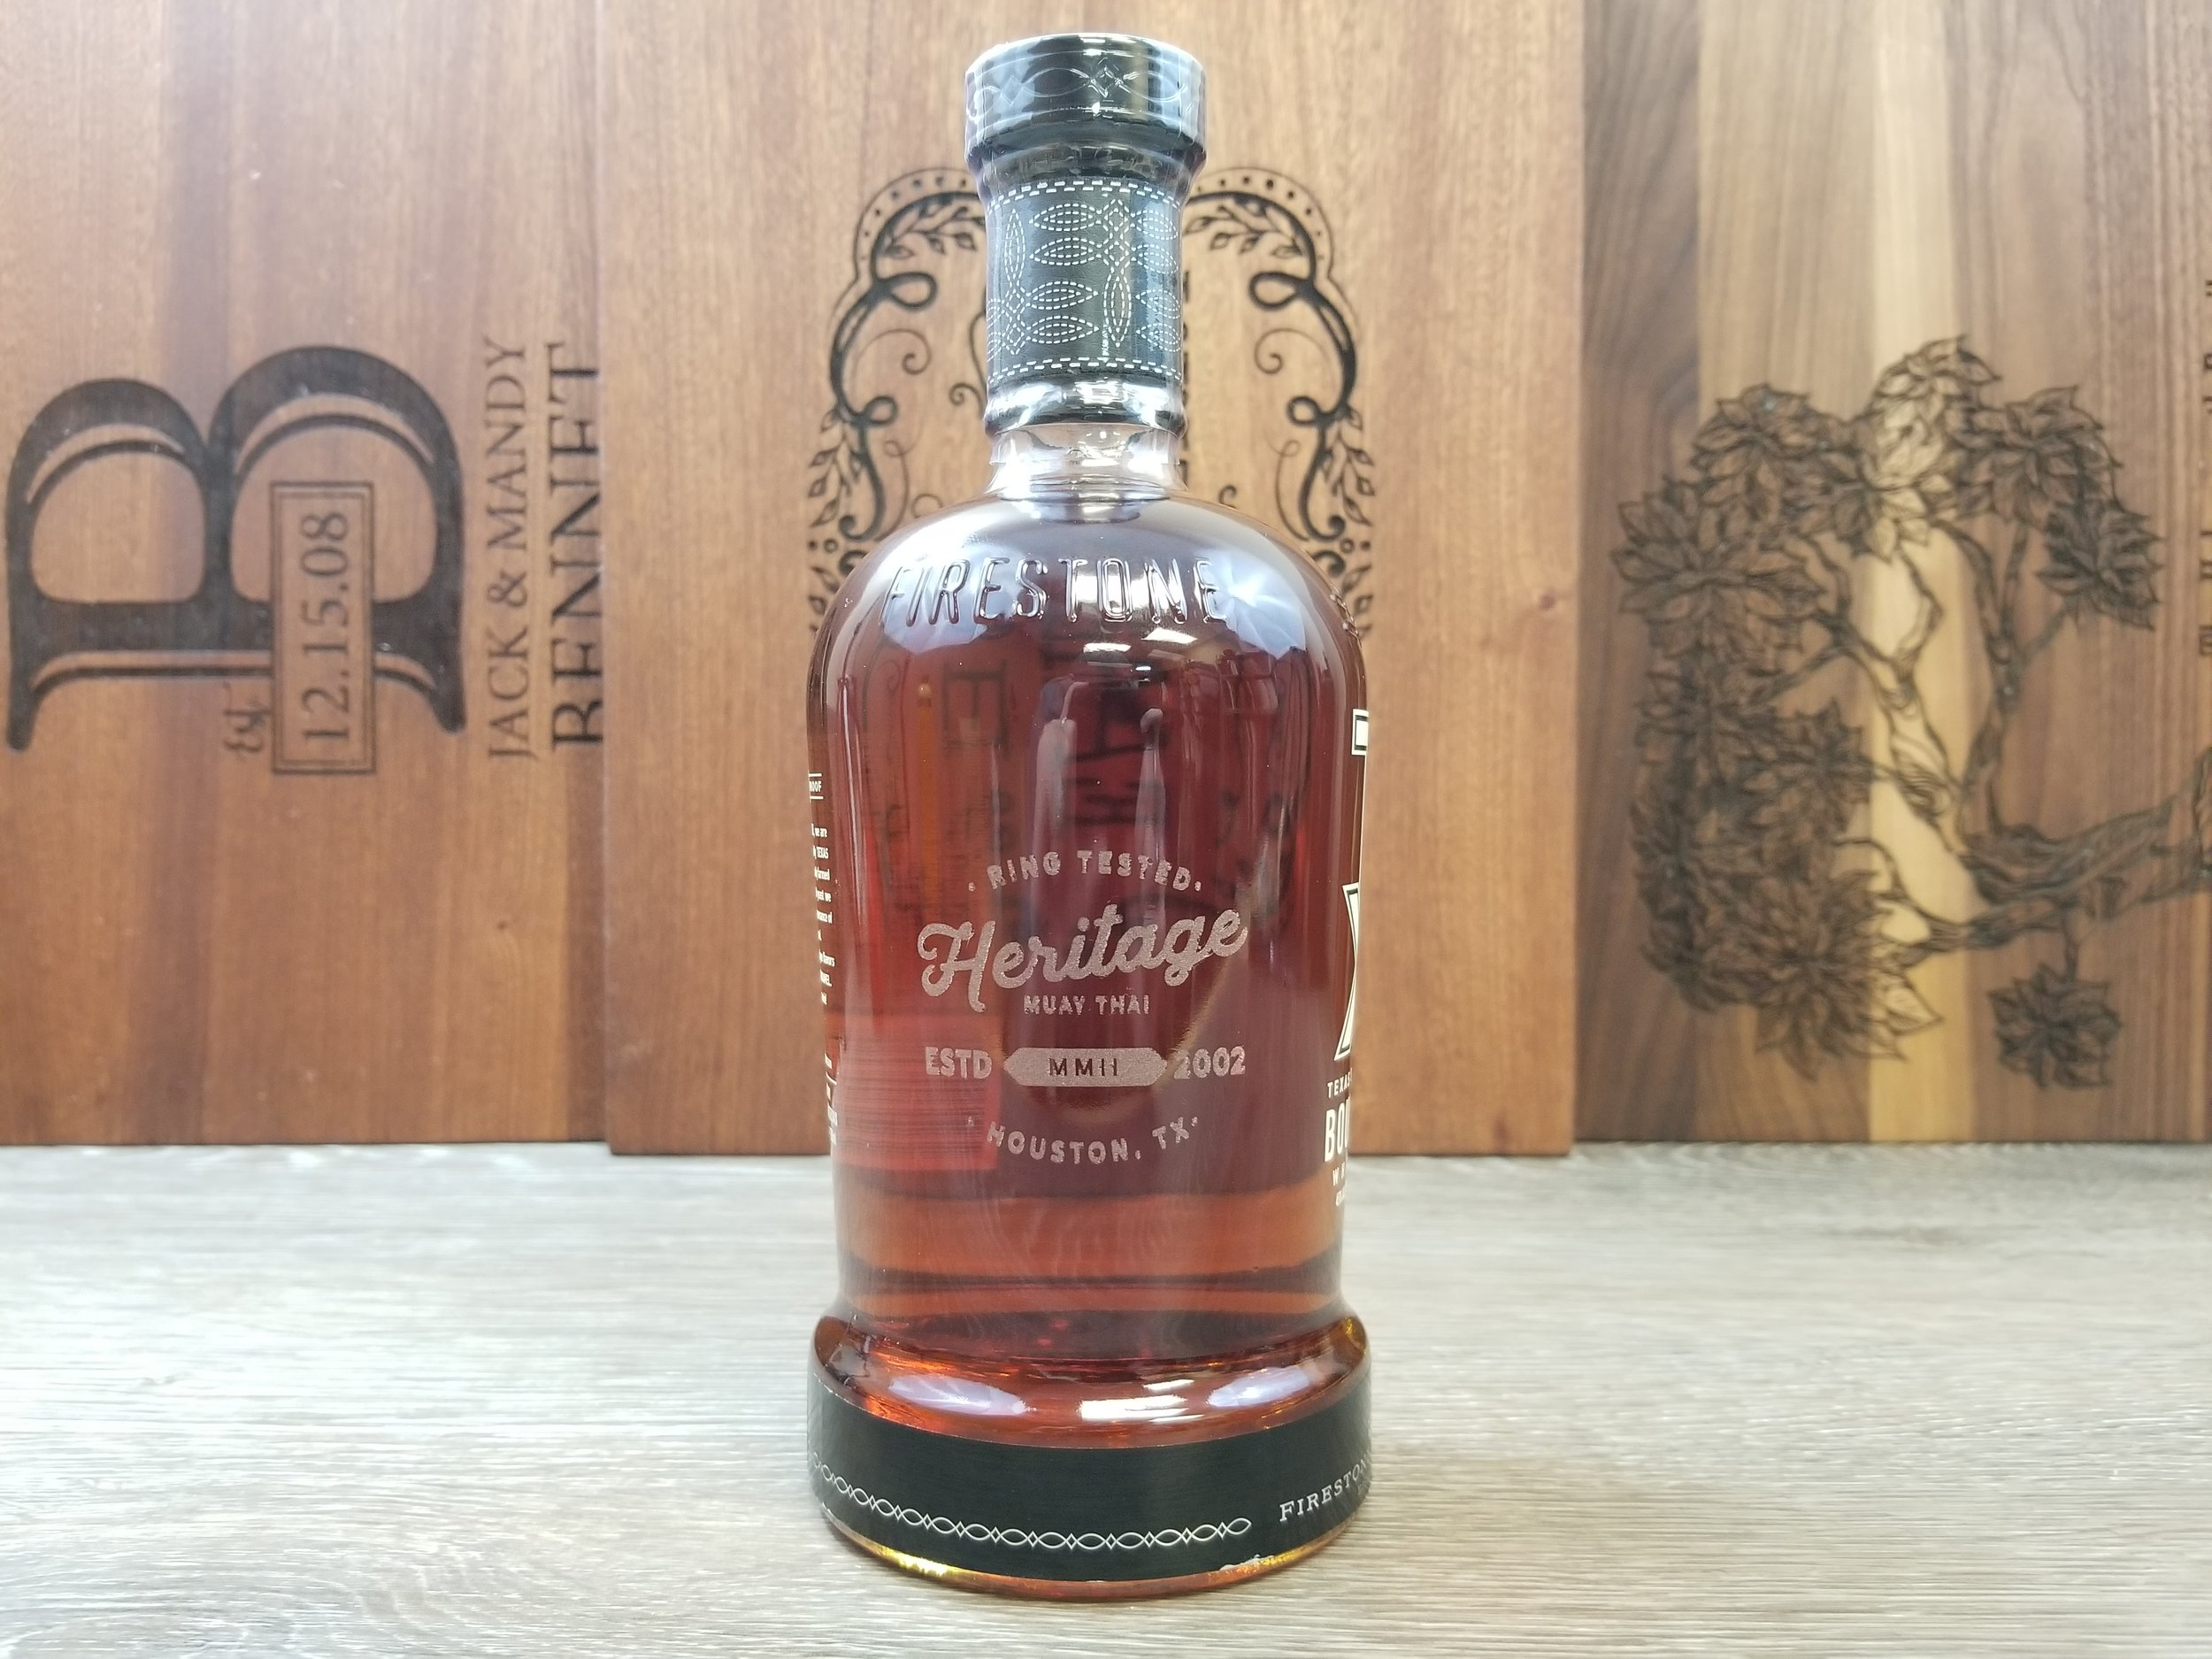 Custom Liquor Bottle Branding - Custom Liquor Bottle Engraving - Corporate Identity Projects - Branding Projects from Engrave It Houston